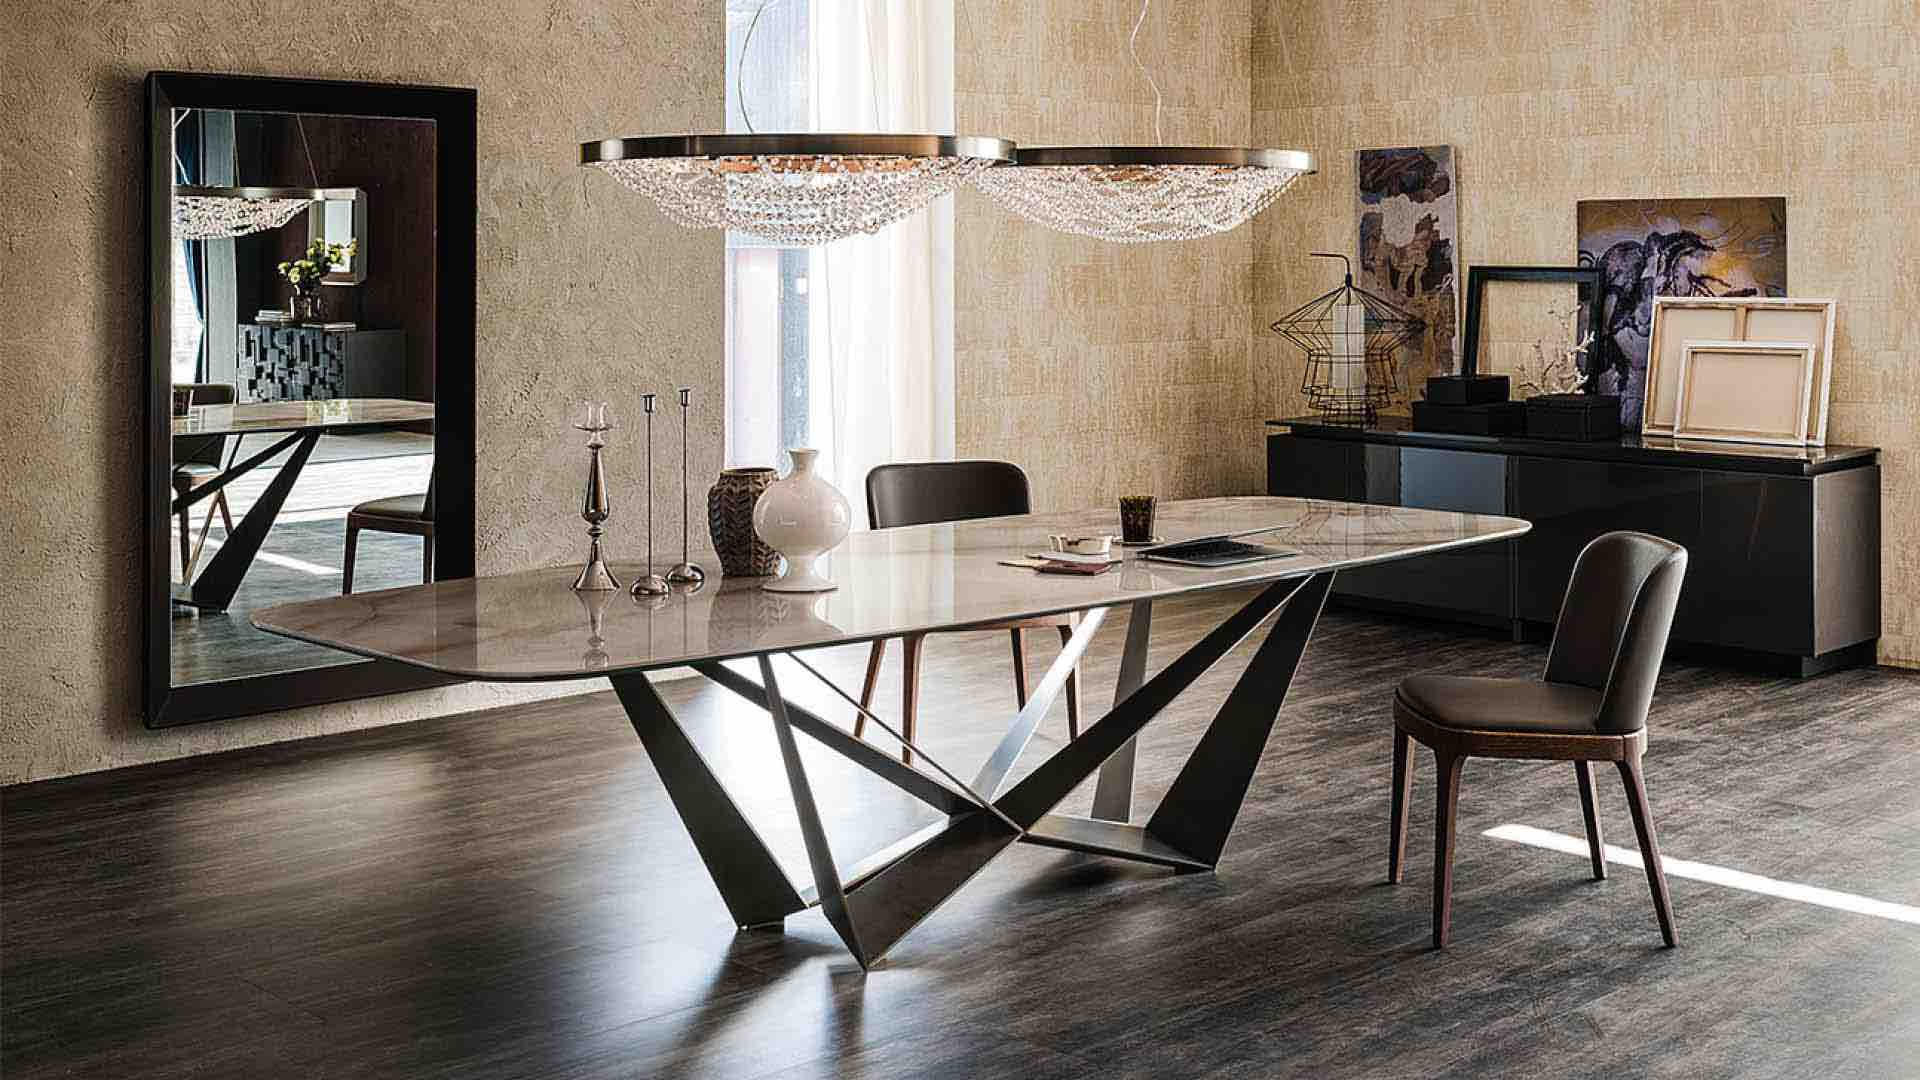 mobilier-design-contemporain-table